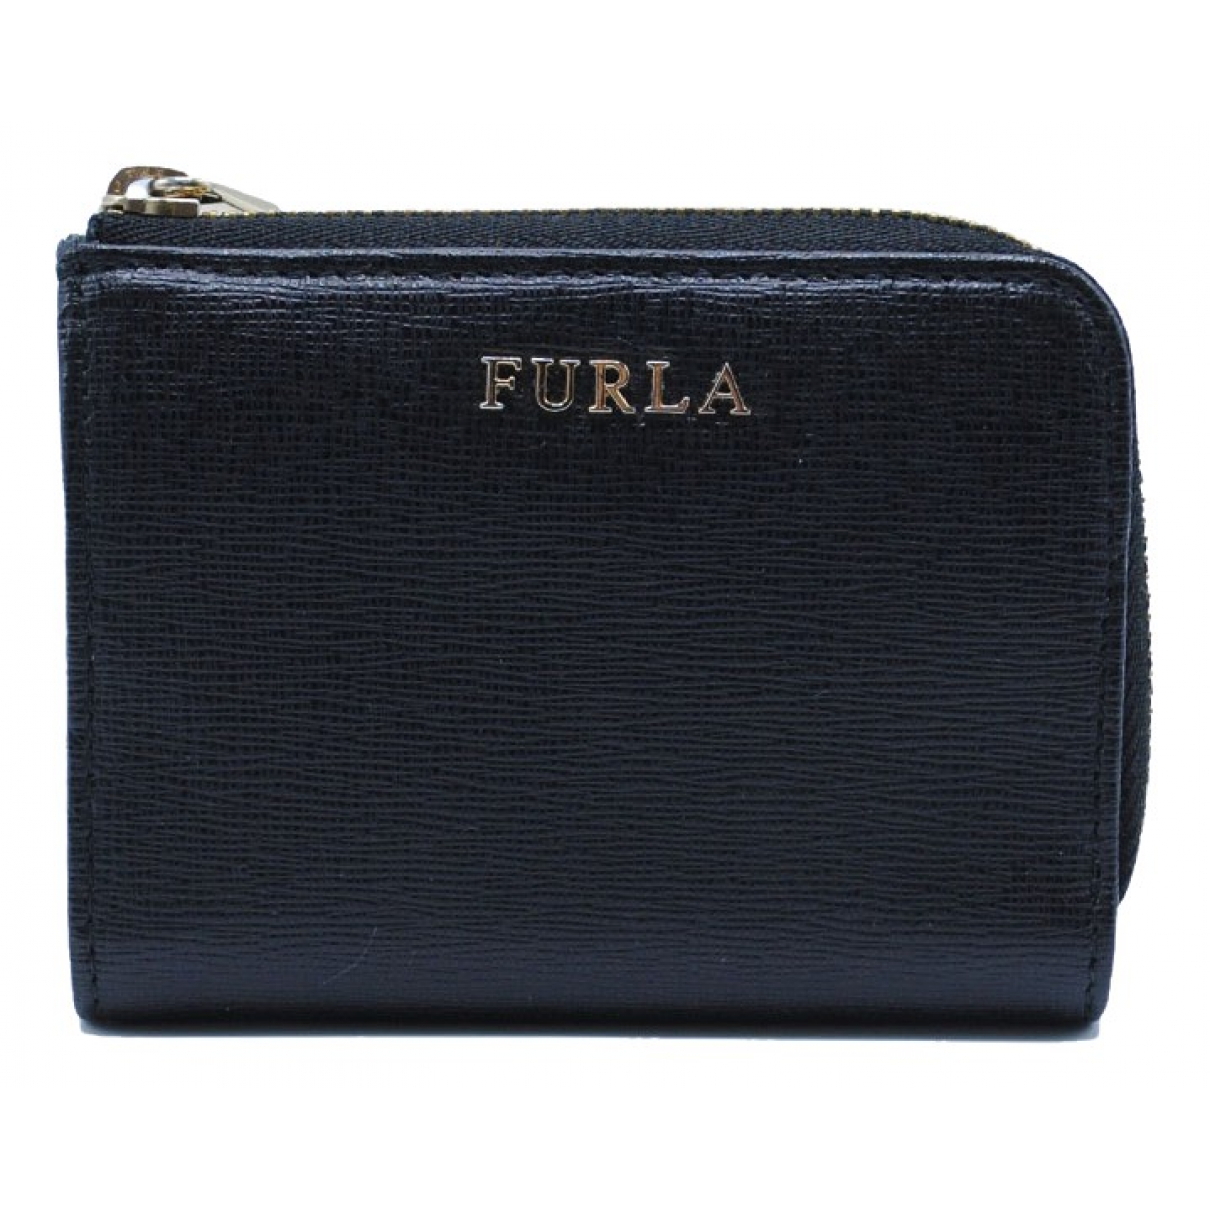 Furla \N Black Leather wallet for Women \N